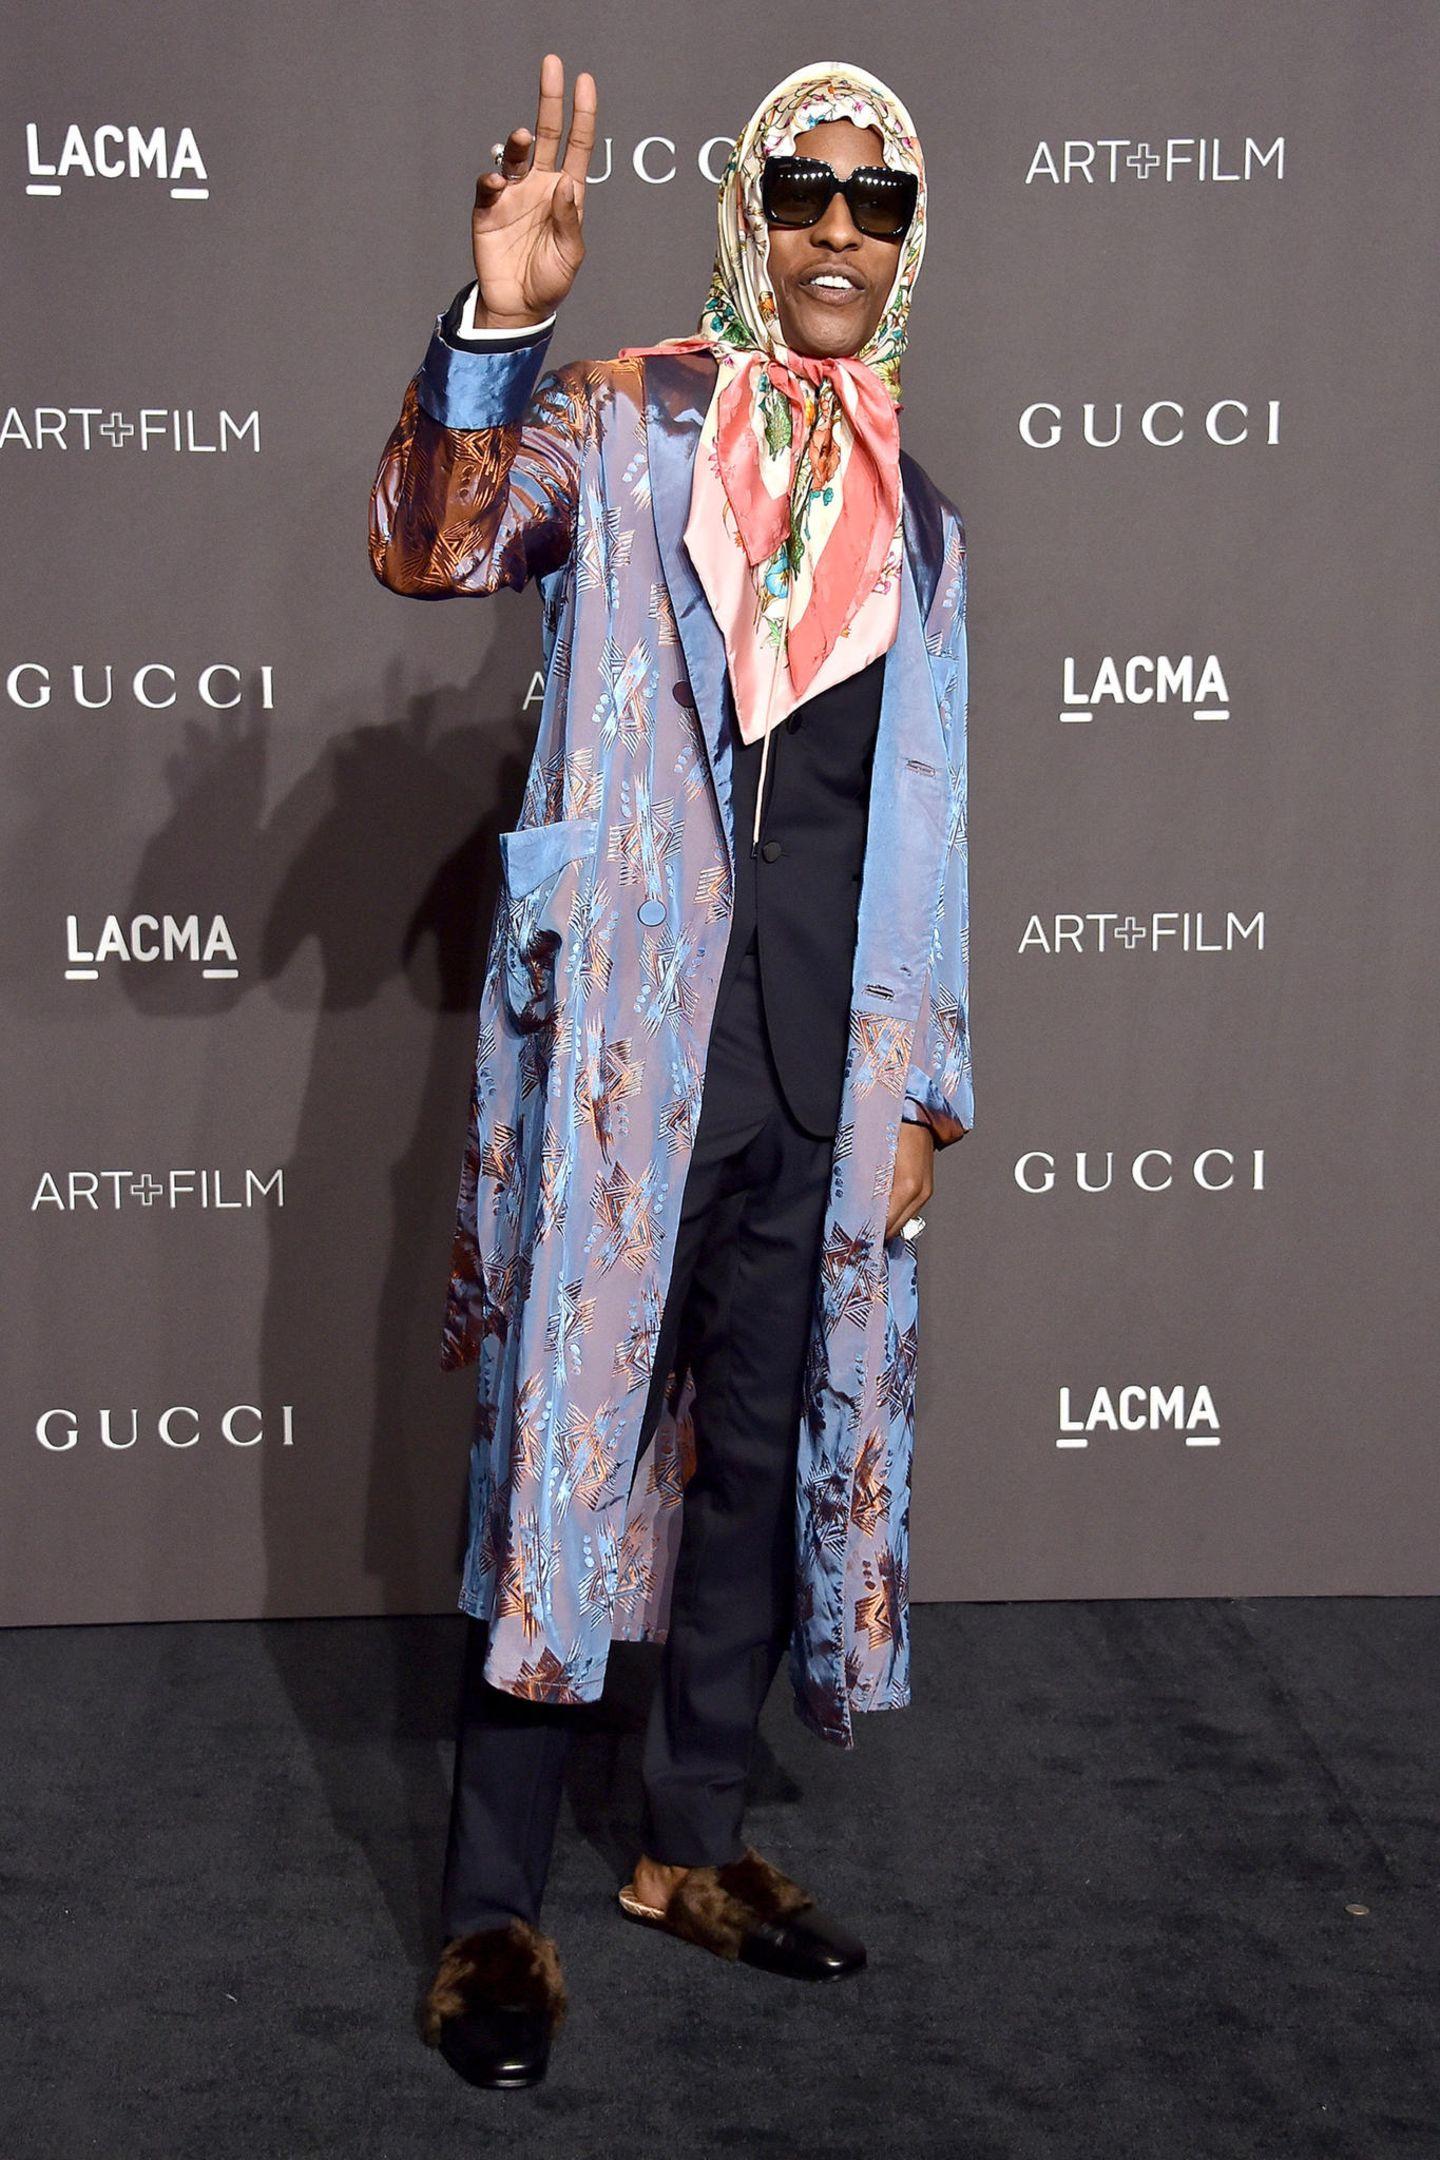 Verspätetes Halloween-Kostüm? Im Morgenmantel-Look erinnert Rapper Asap Rocky doch stark an ein Großmütterchen.